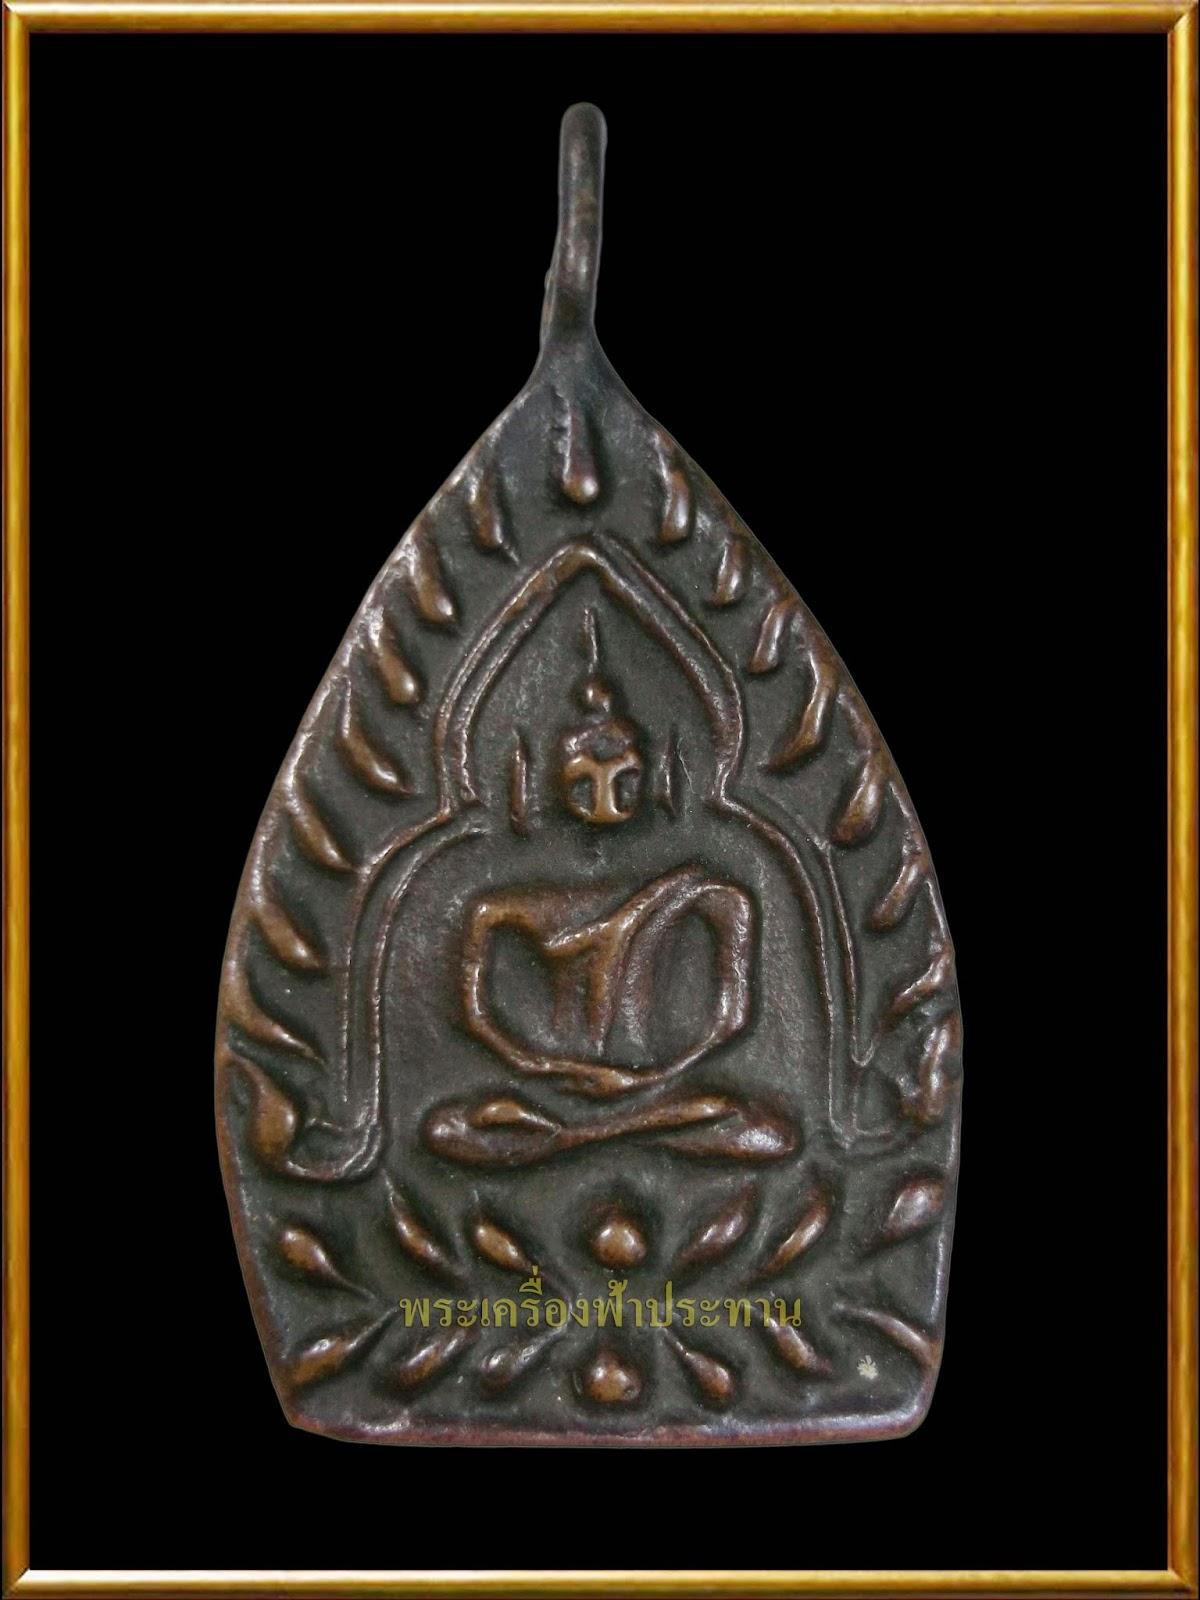 http://tubtimthong-amulet.blogspot.com/2014/10/blog-post_27.html